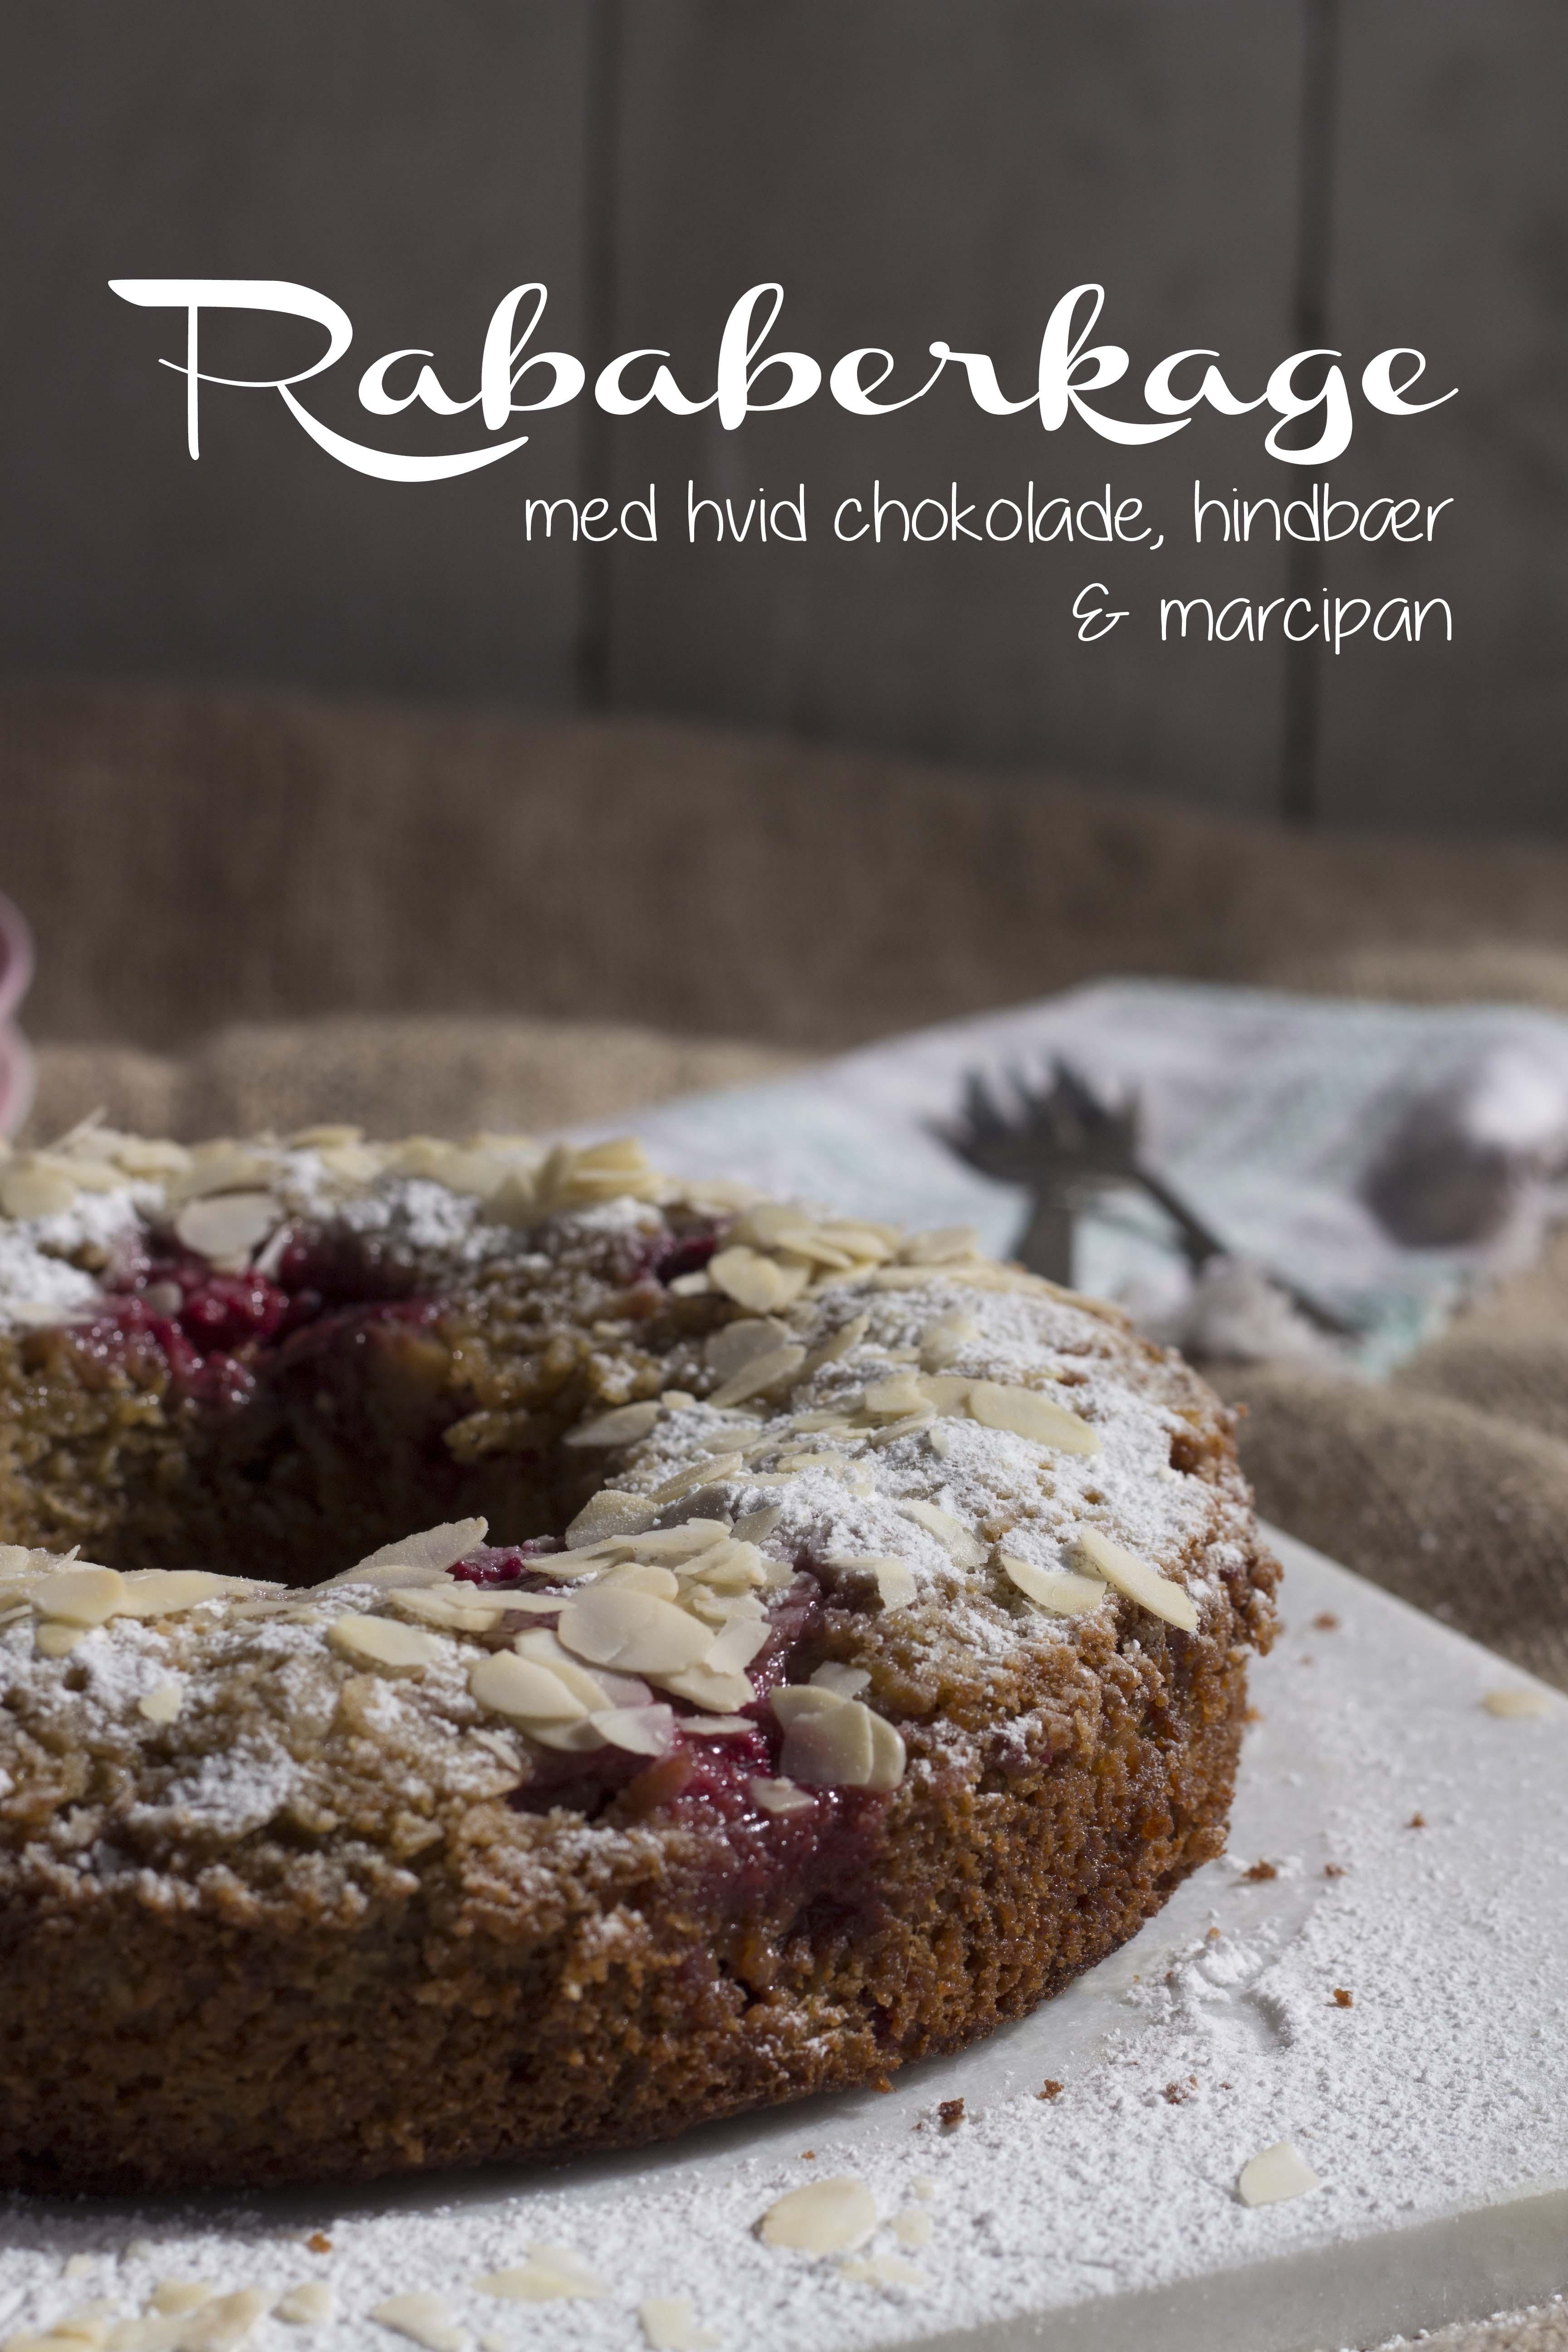 Raberberkage med hvid chokolade, hindbær og marcipan